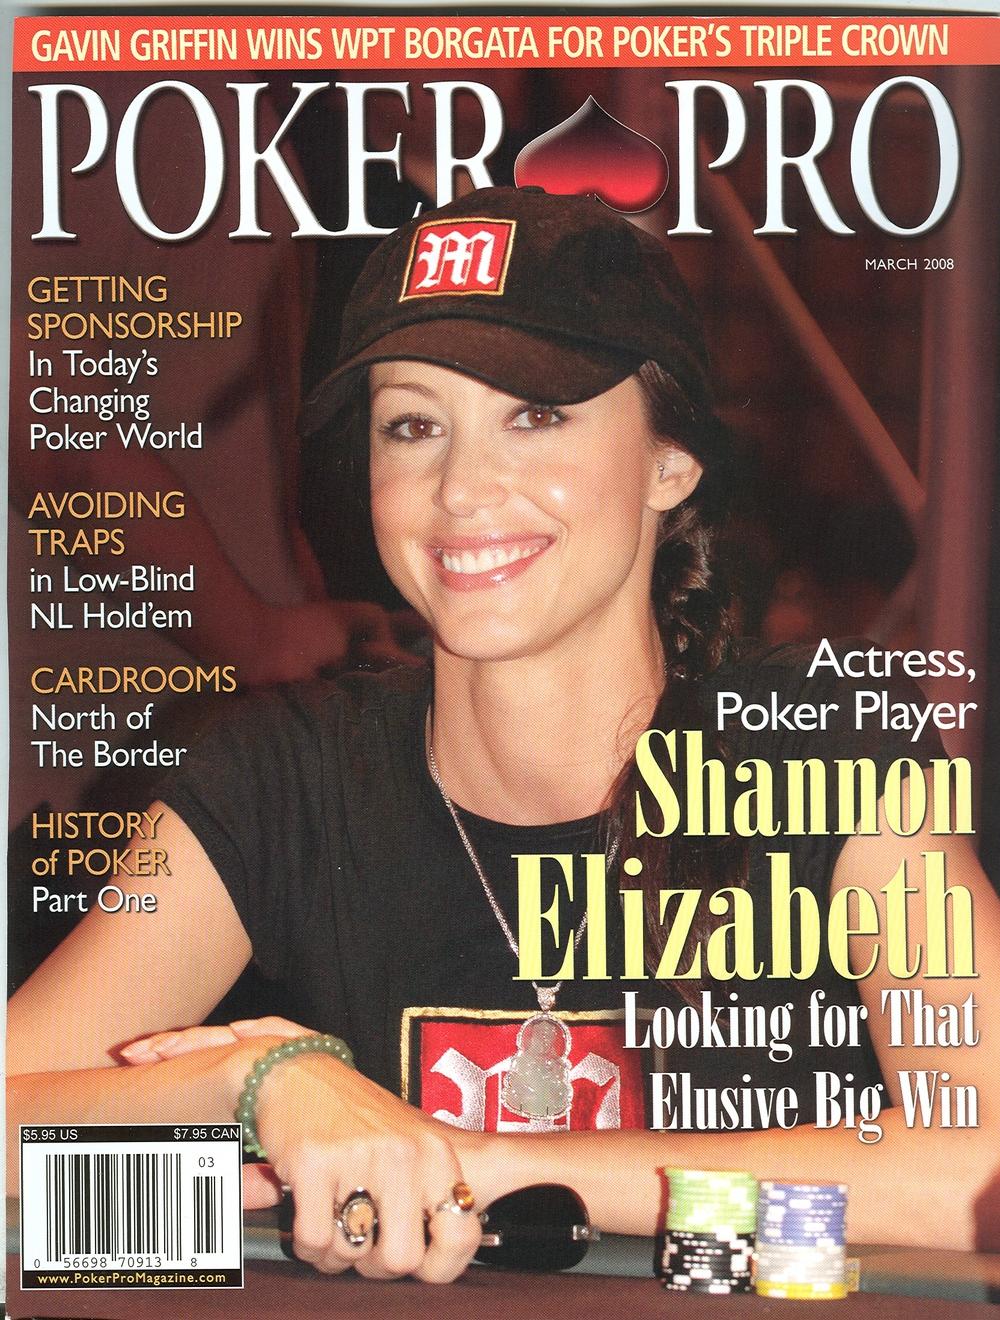 SE_PokerProMagazine_March 2008 1.jpg